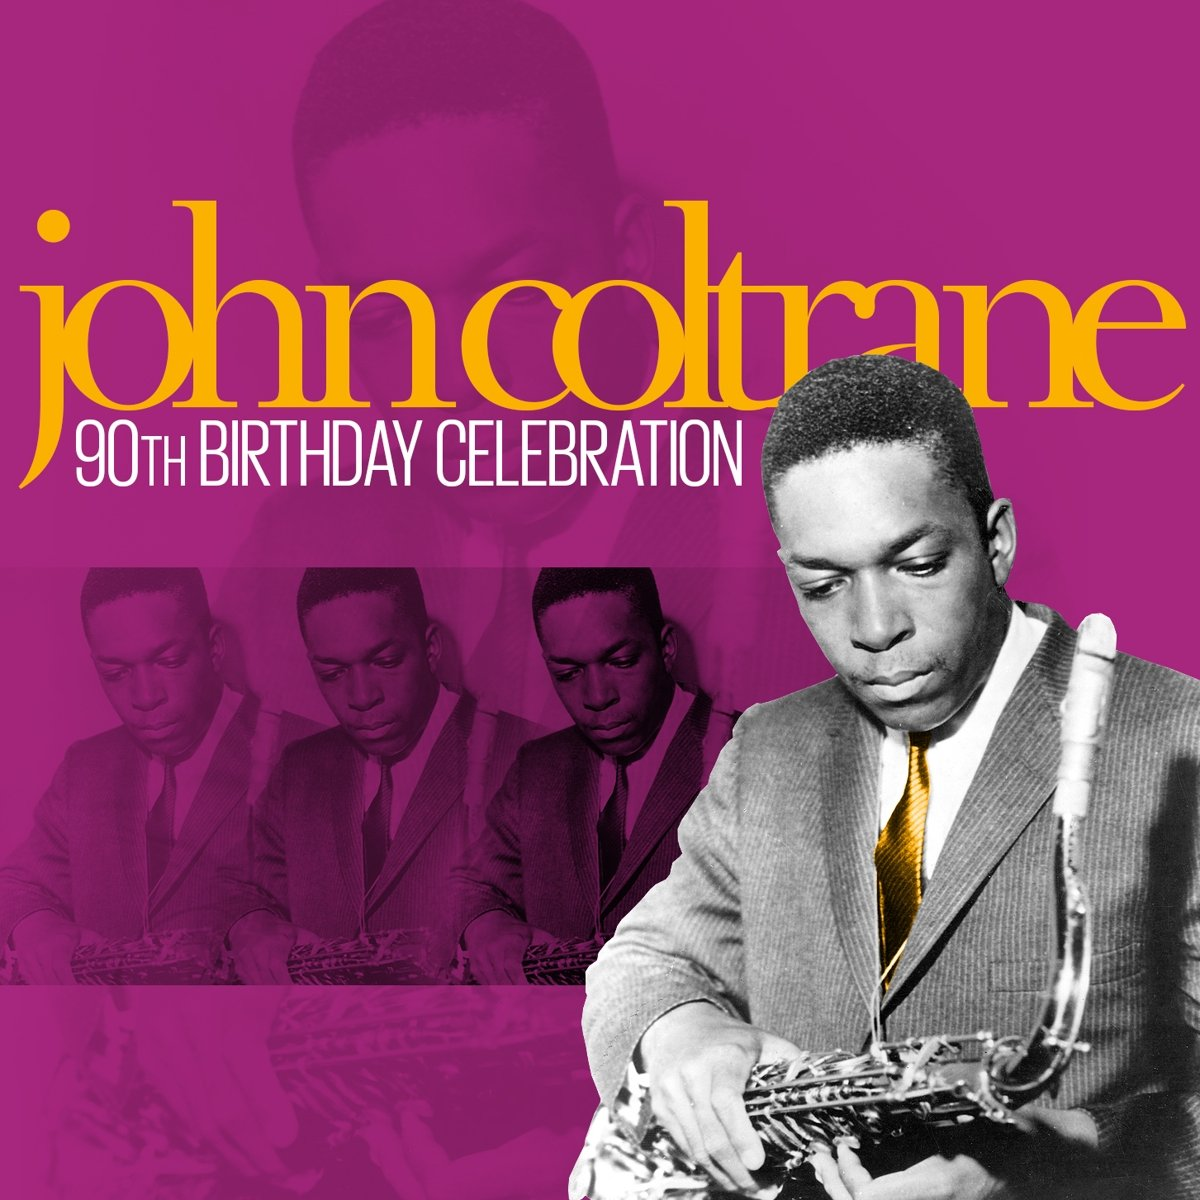 Джон Колтрейн John Coltrane. 90th Birthday Celebration (2 CD) джон колтрейн john coltrane giant steps the best of the early years 10 cd